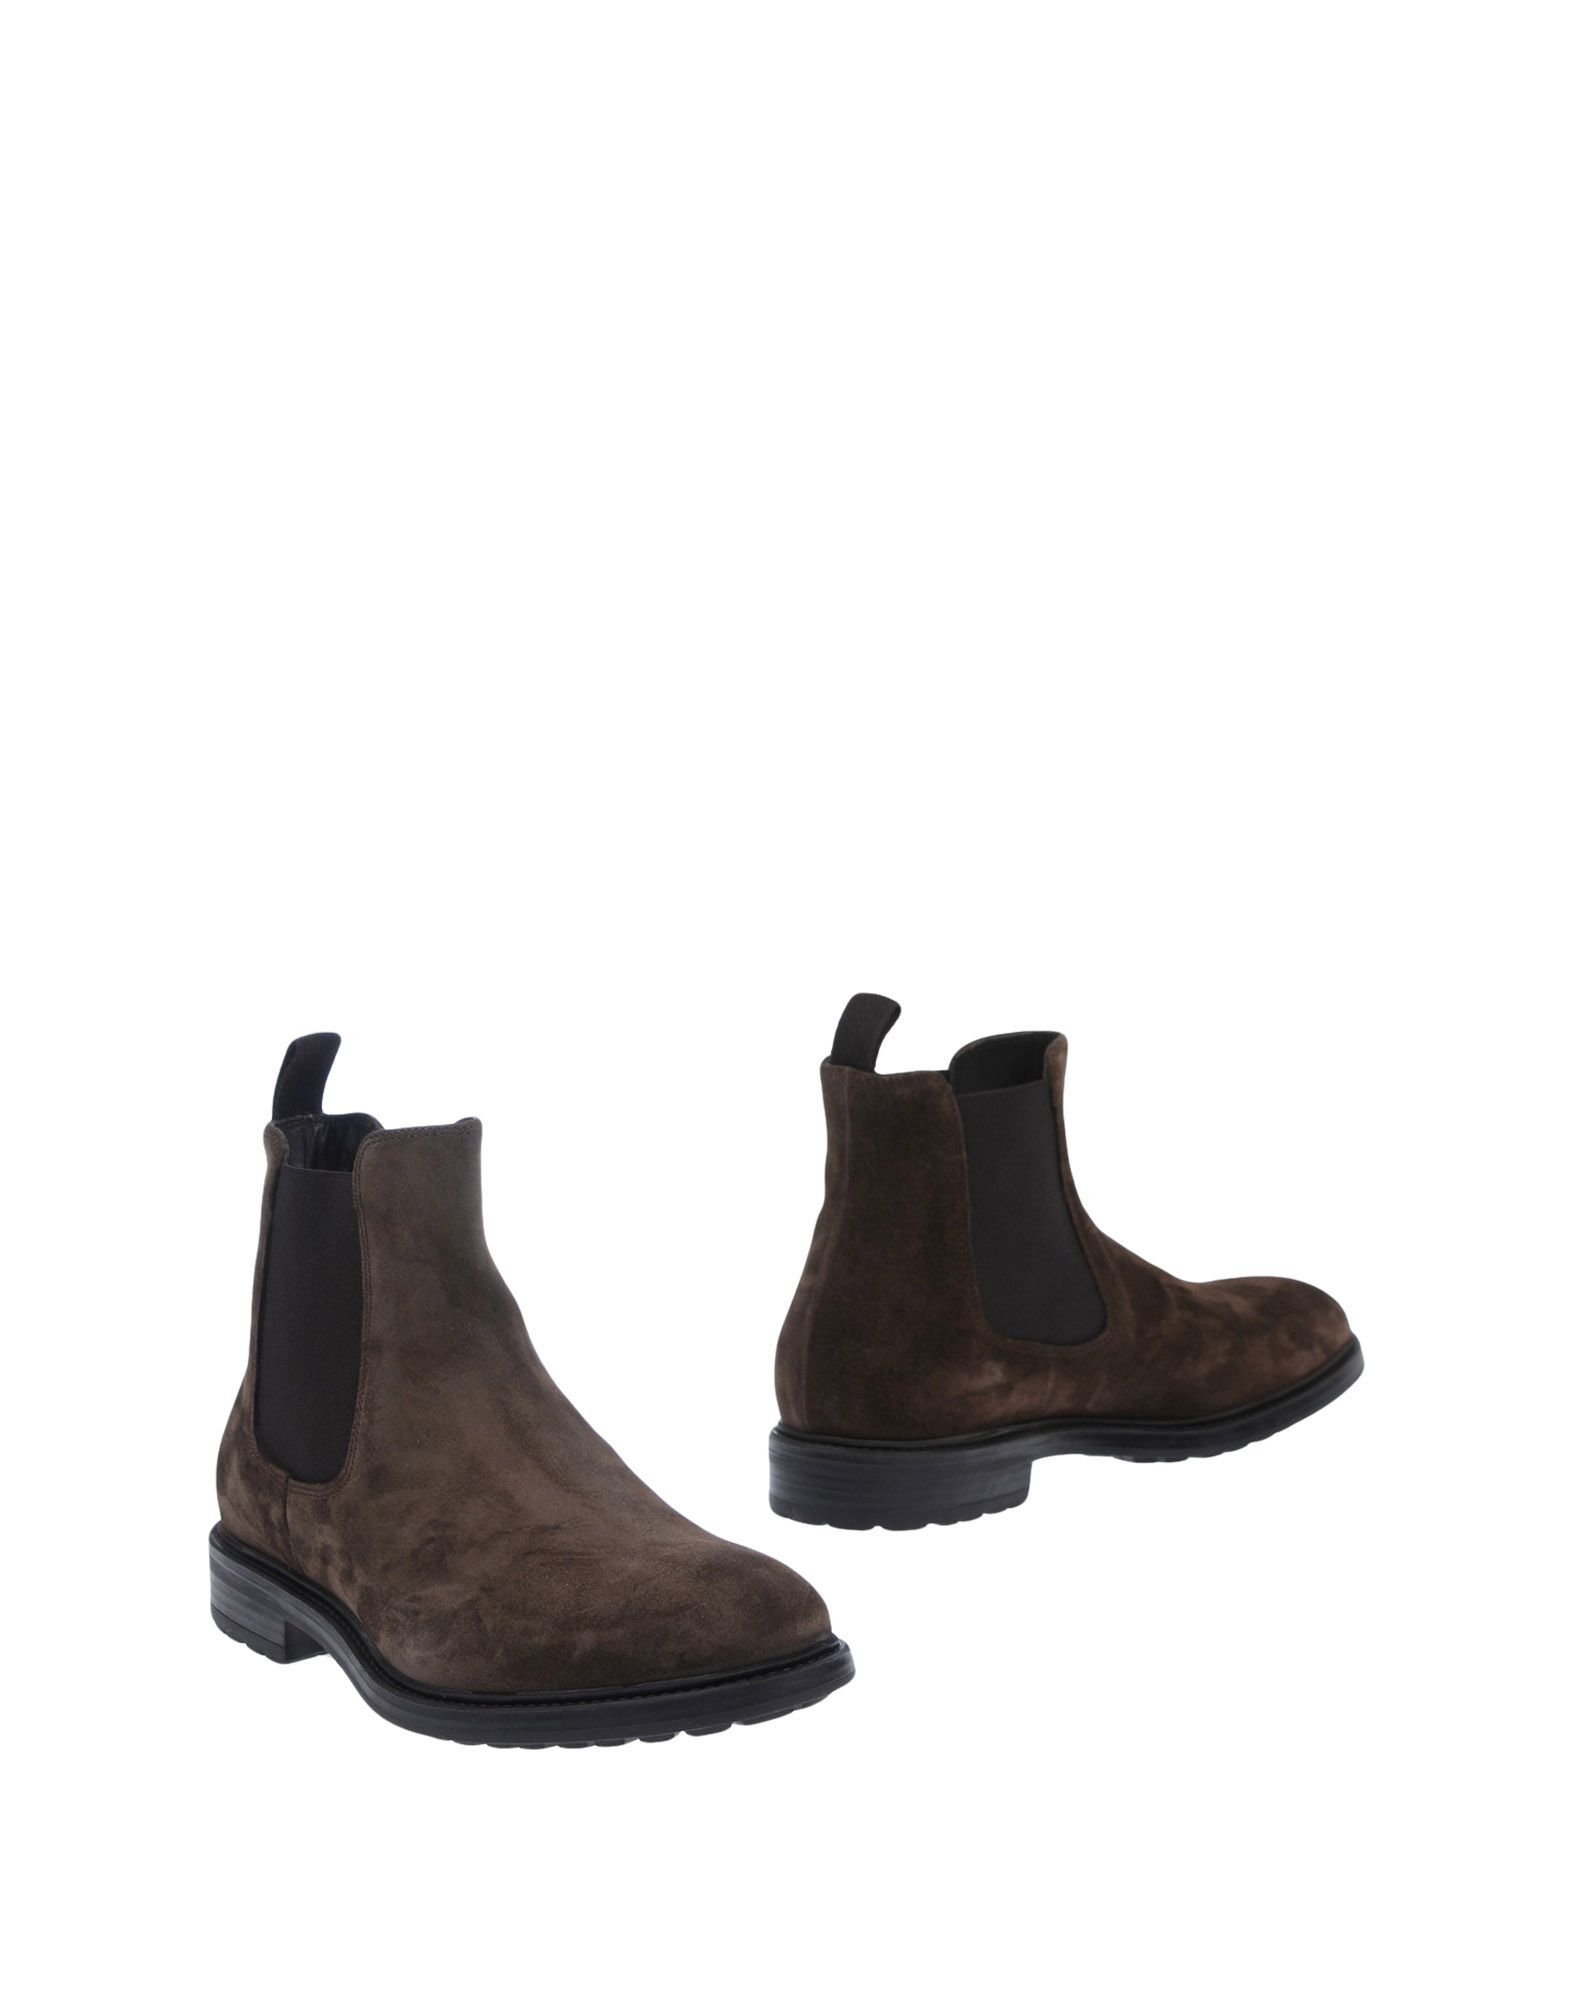 Doucal's Stiefelette Herren  11508832LV 11508832LV 11508832LV Gute Qualität beliebte Schuhe a0fbfd